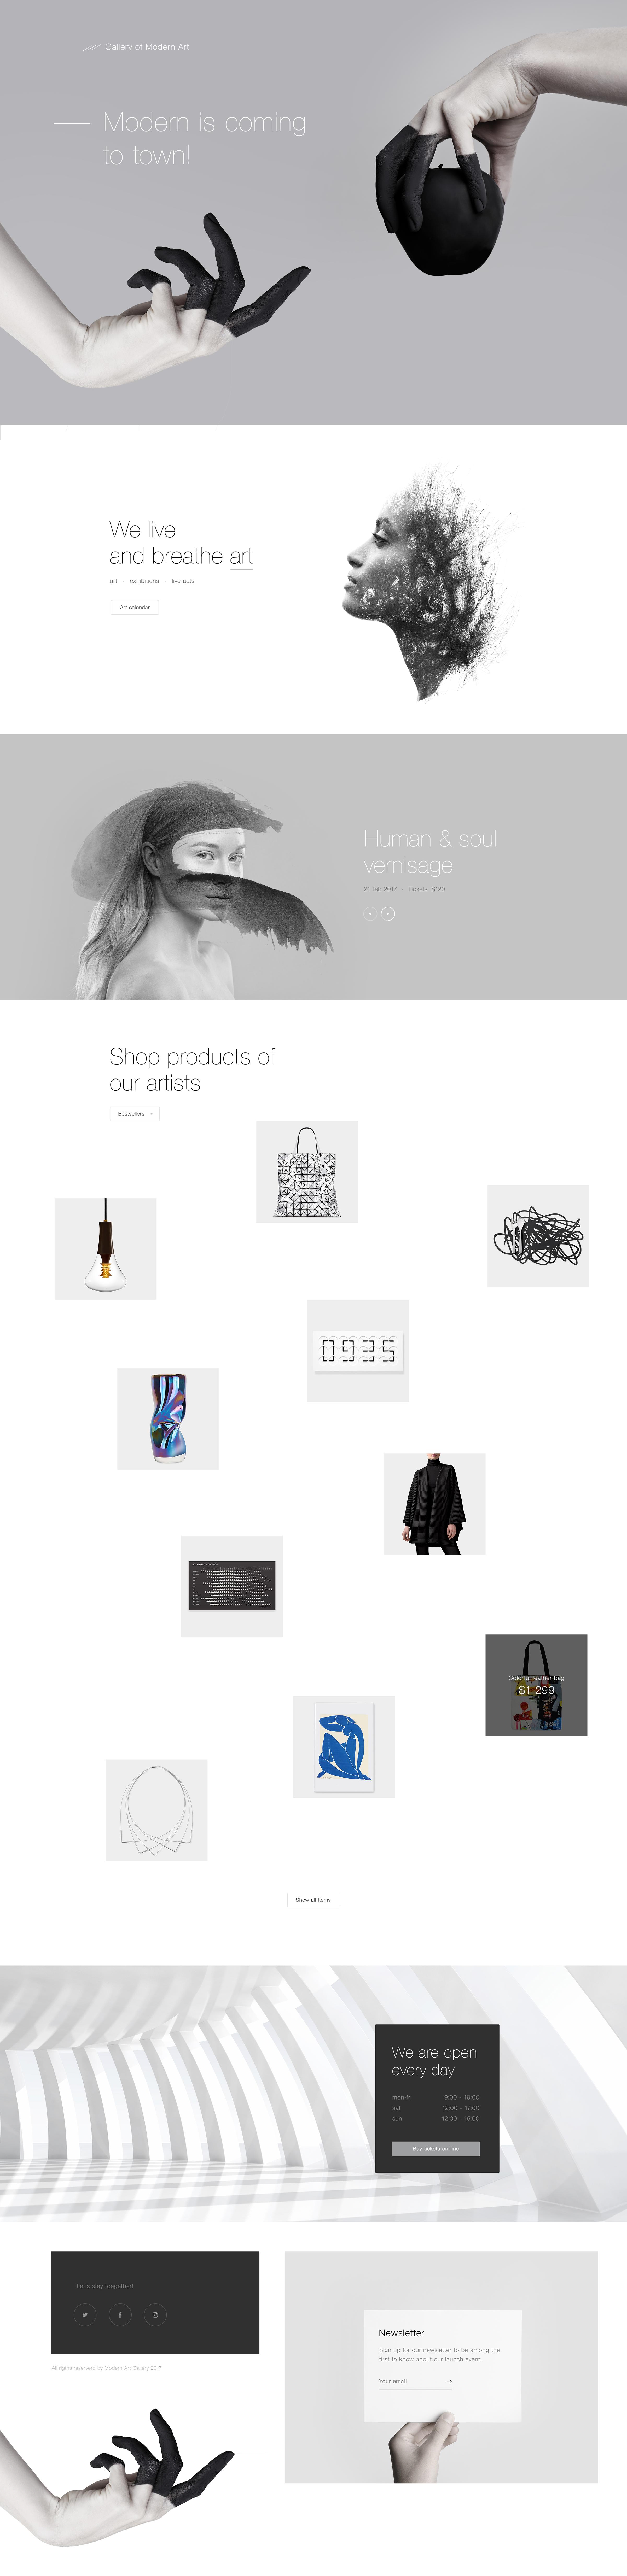 Art Gallery Web Design Web Design Inspiration Web Layout Design